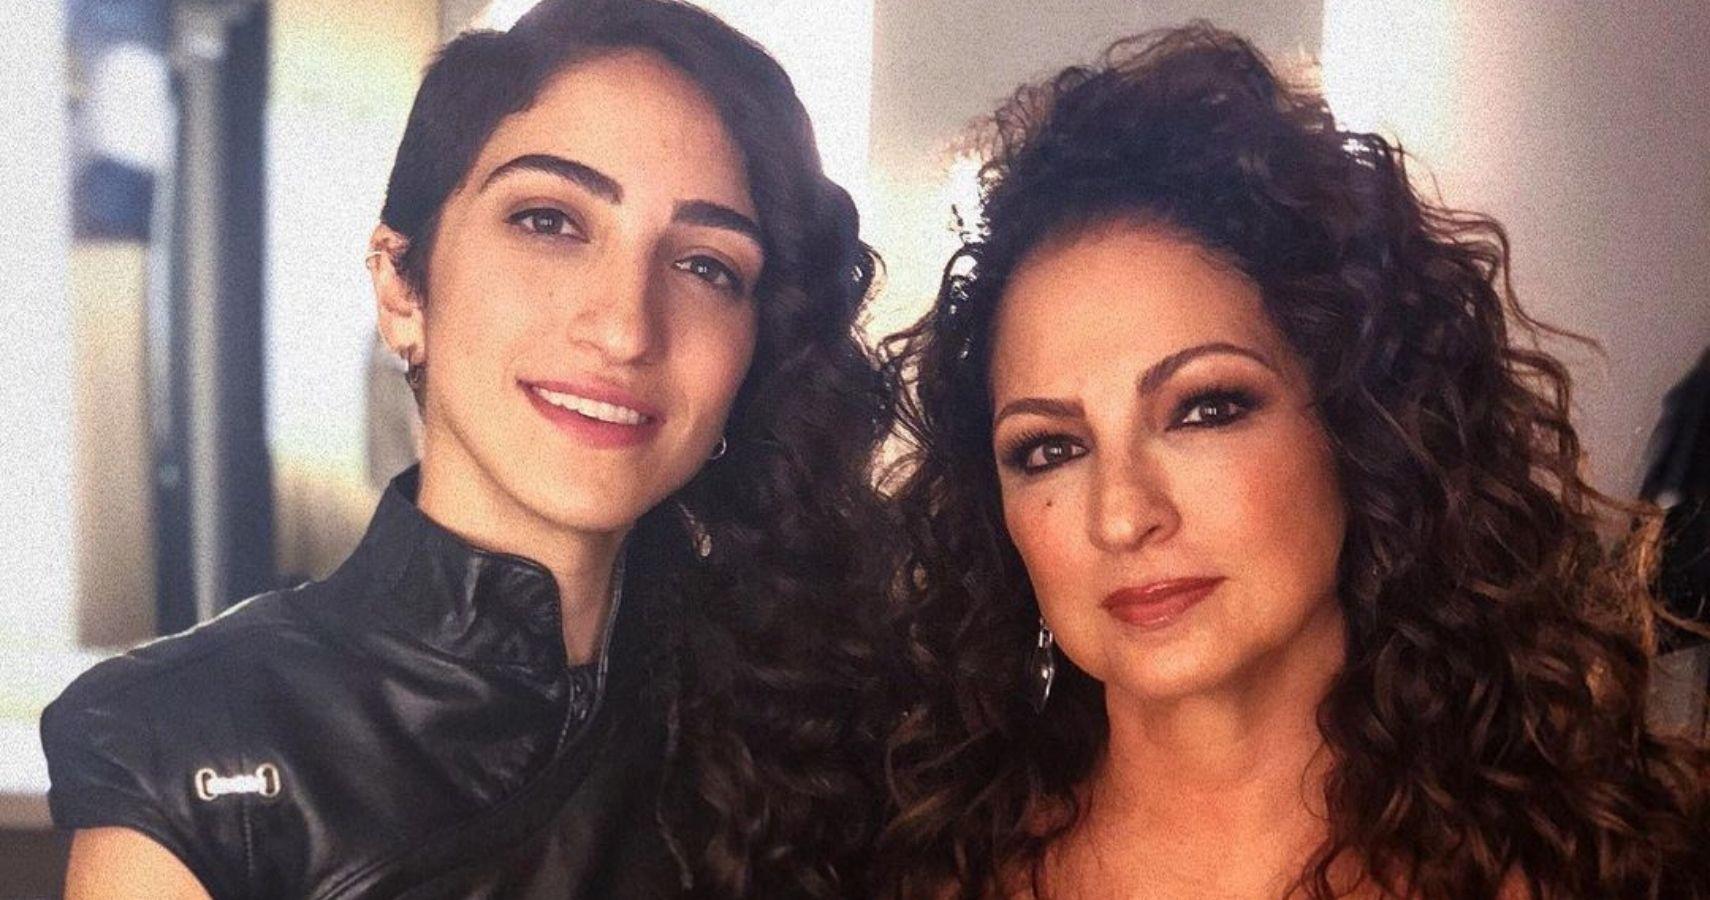 Gloria Estefan Talks On Daughter's Gender | Moms.com